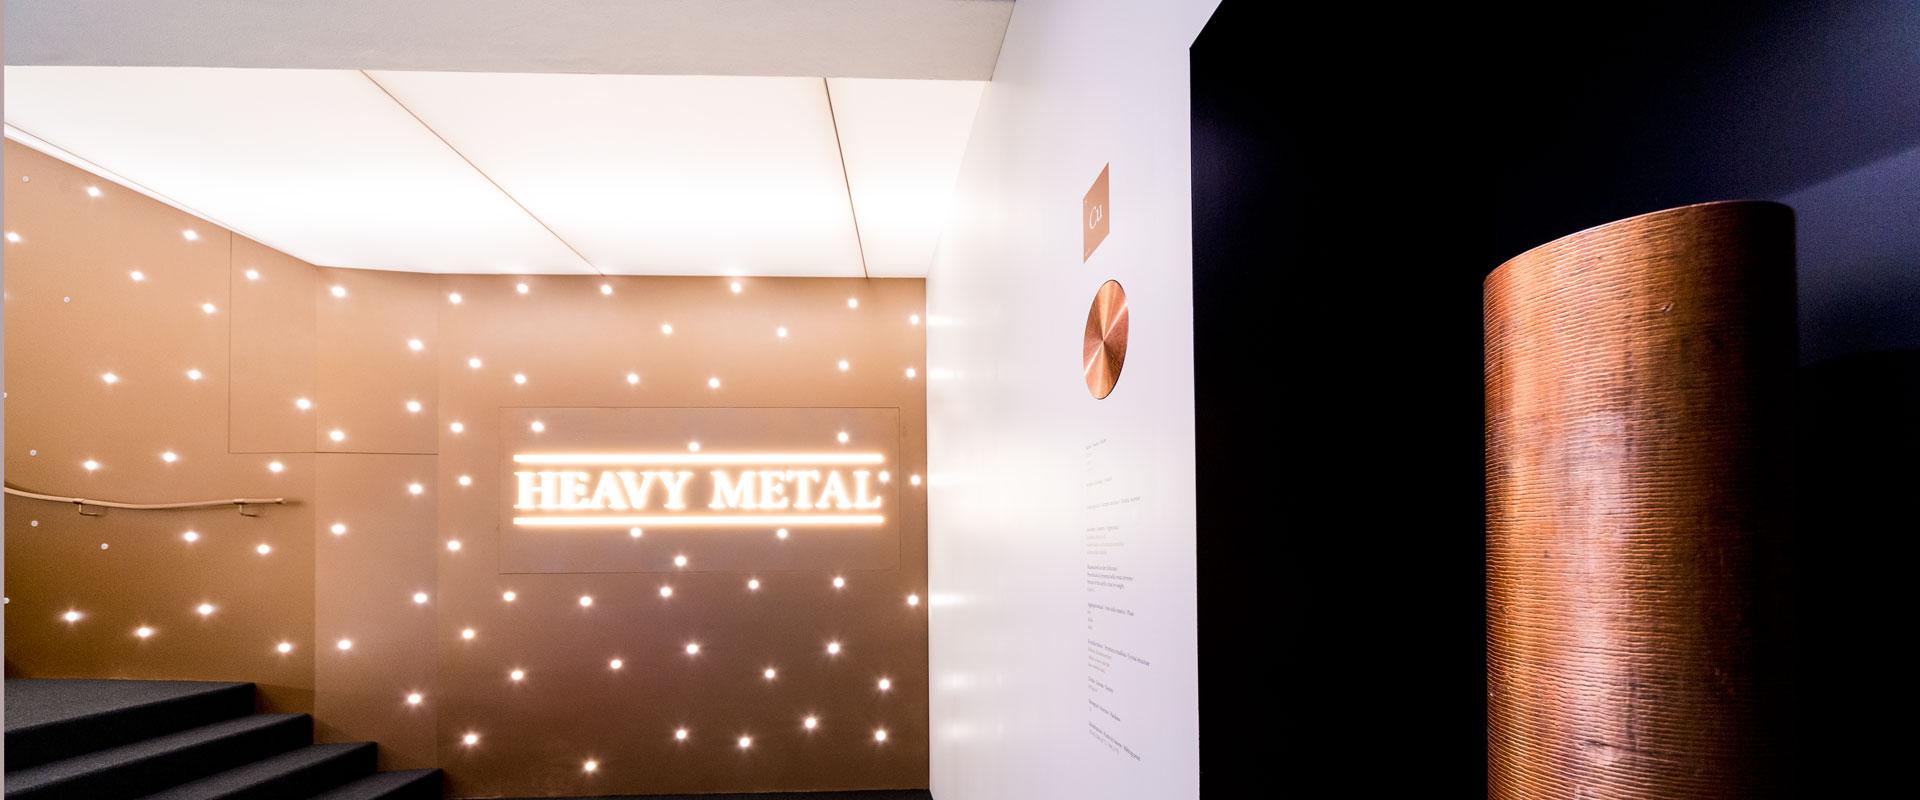 heavy metal wie kupfer die welt ver nderte sonderausstellung. Black Bedroom Furniture Sets. Home Design Ideas